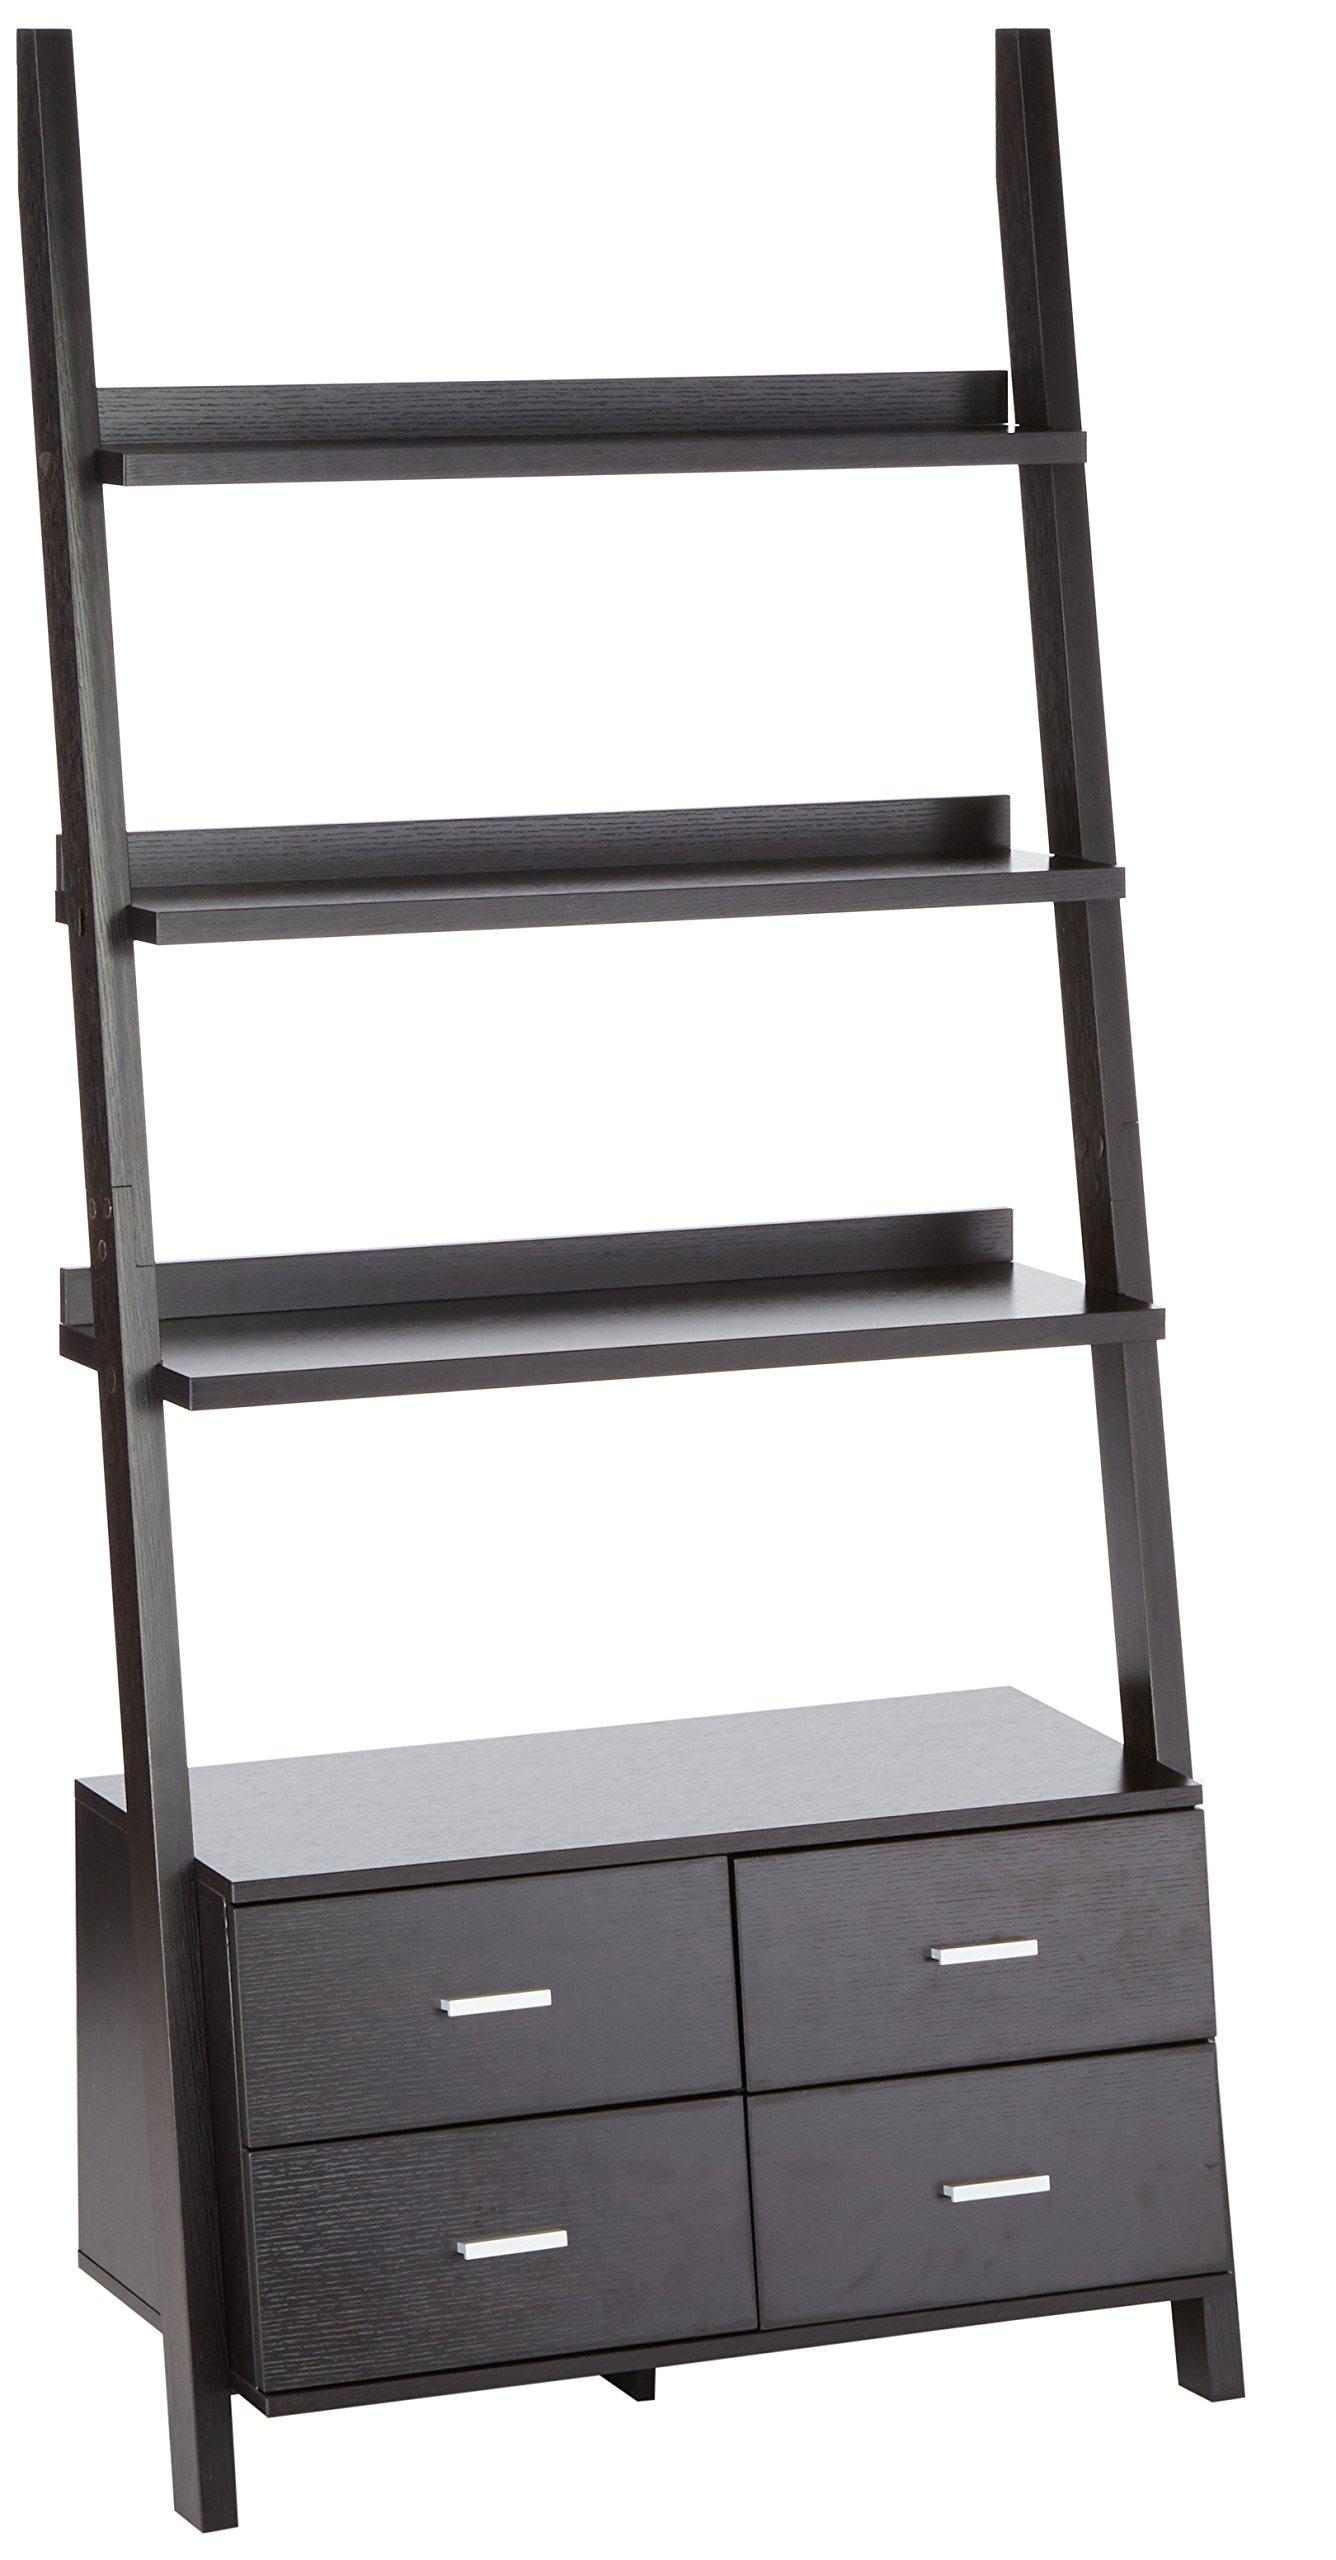 Coaster 800319 Home Furnishings Ladder Bookcase, Cappuccino by Coaster Home Furnishings